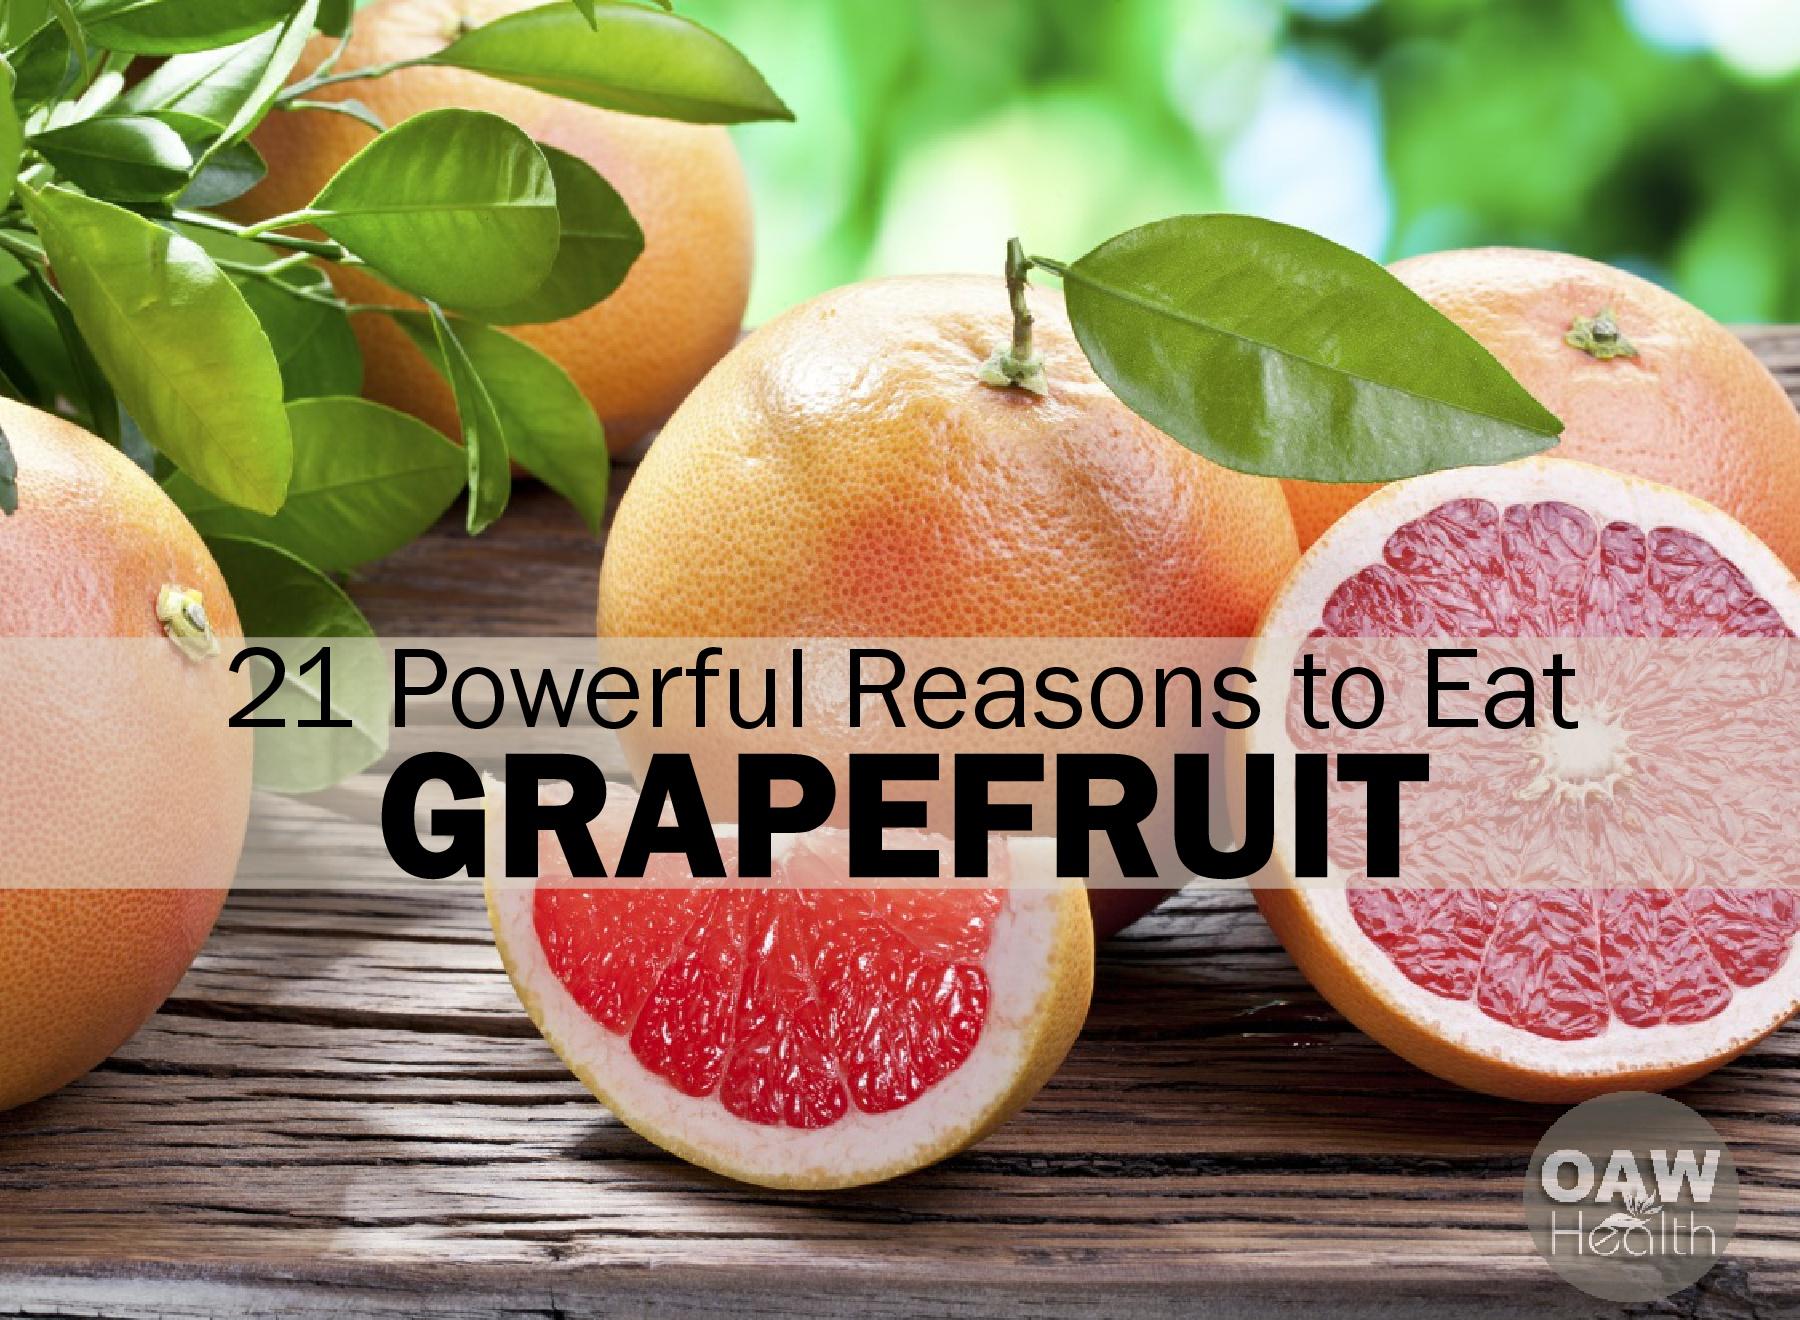 21 Powerful Reasons to Eat Grapefruit